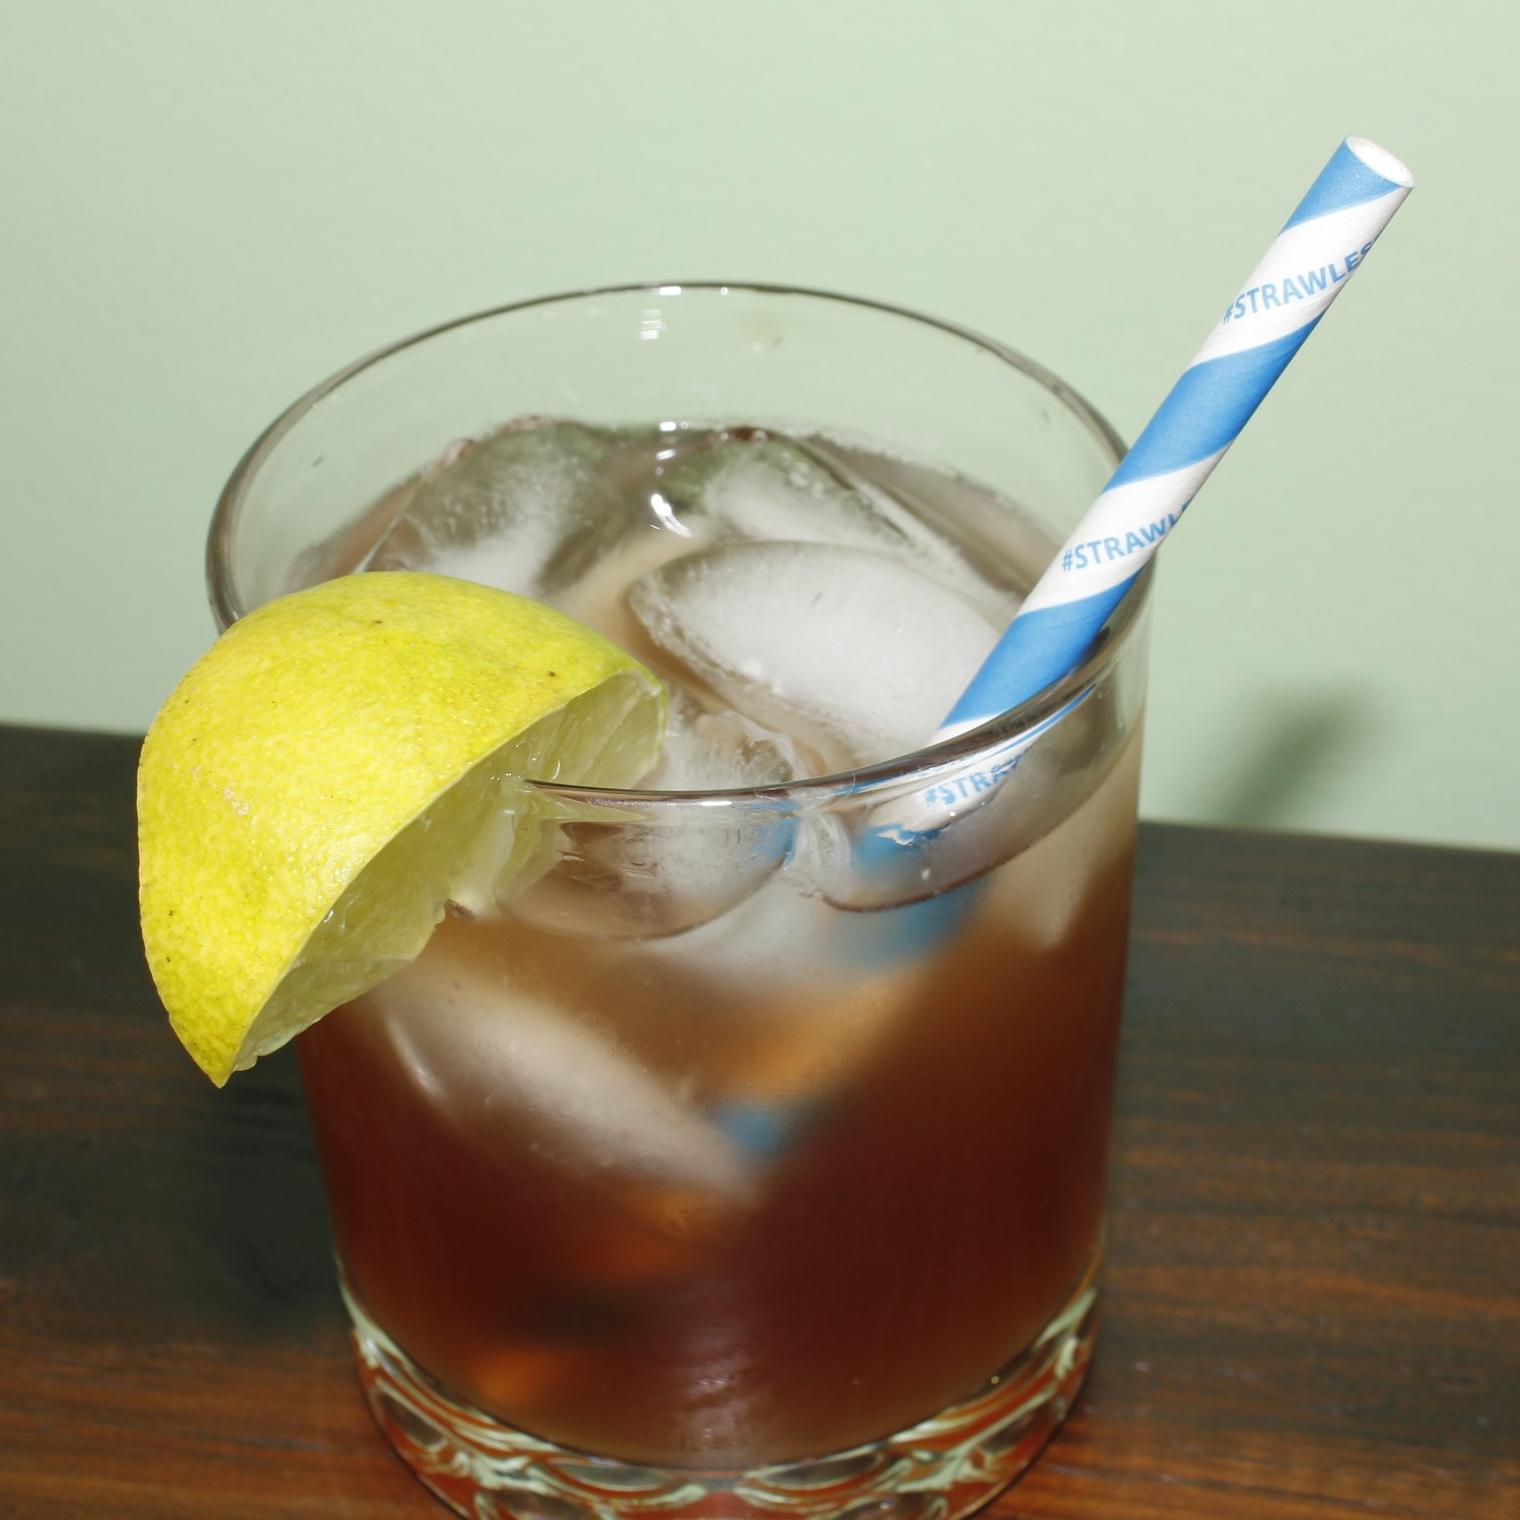 "6"" Strawless Ocean Cocktail Straw"